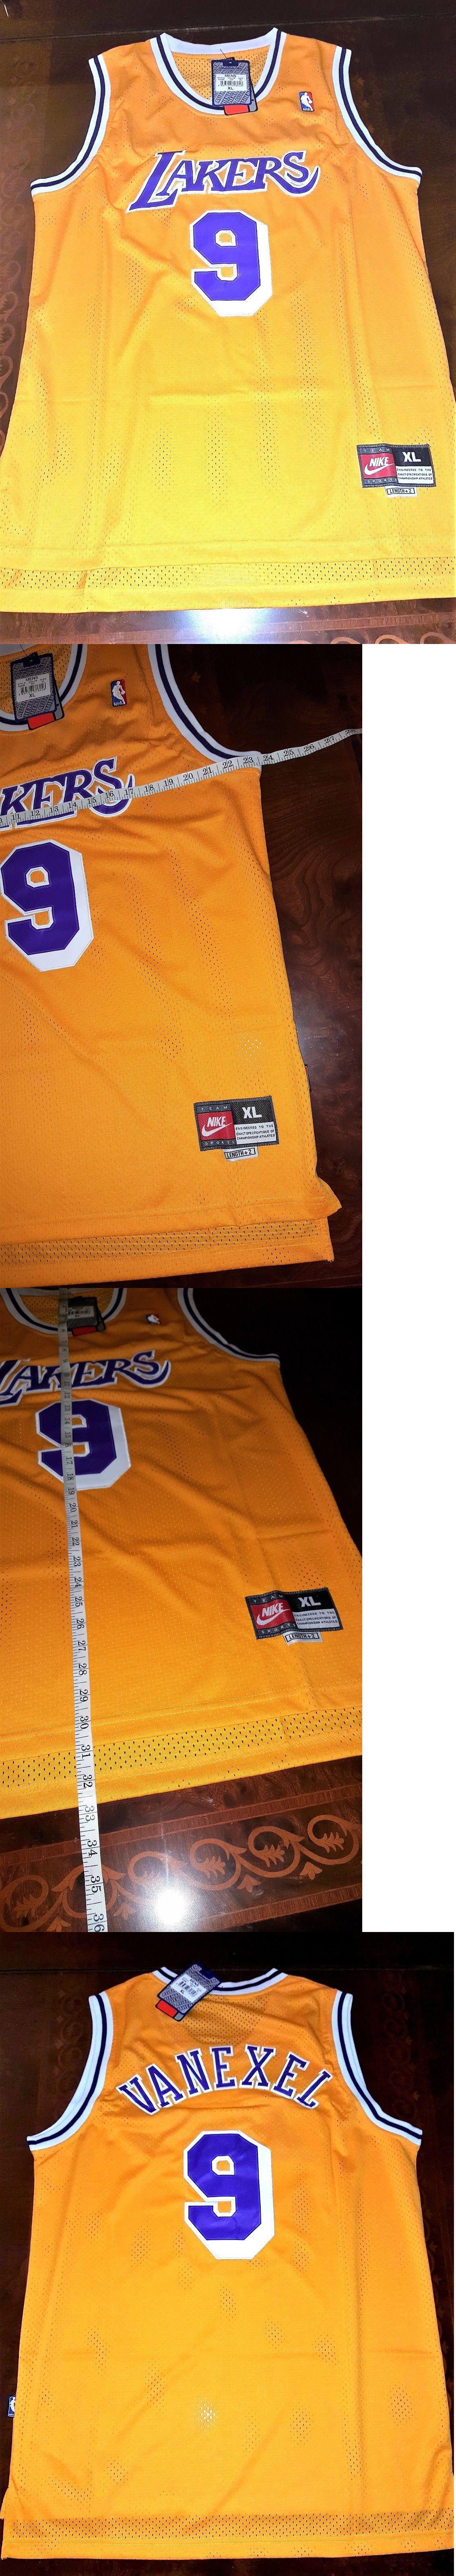 282e2dc761a ... jersey Basketball-NBA 24442 Throwback Retro Nick Van Exel Los Angeles  Lakers Yellow Nba Mens ...